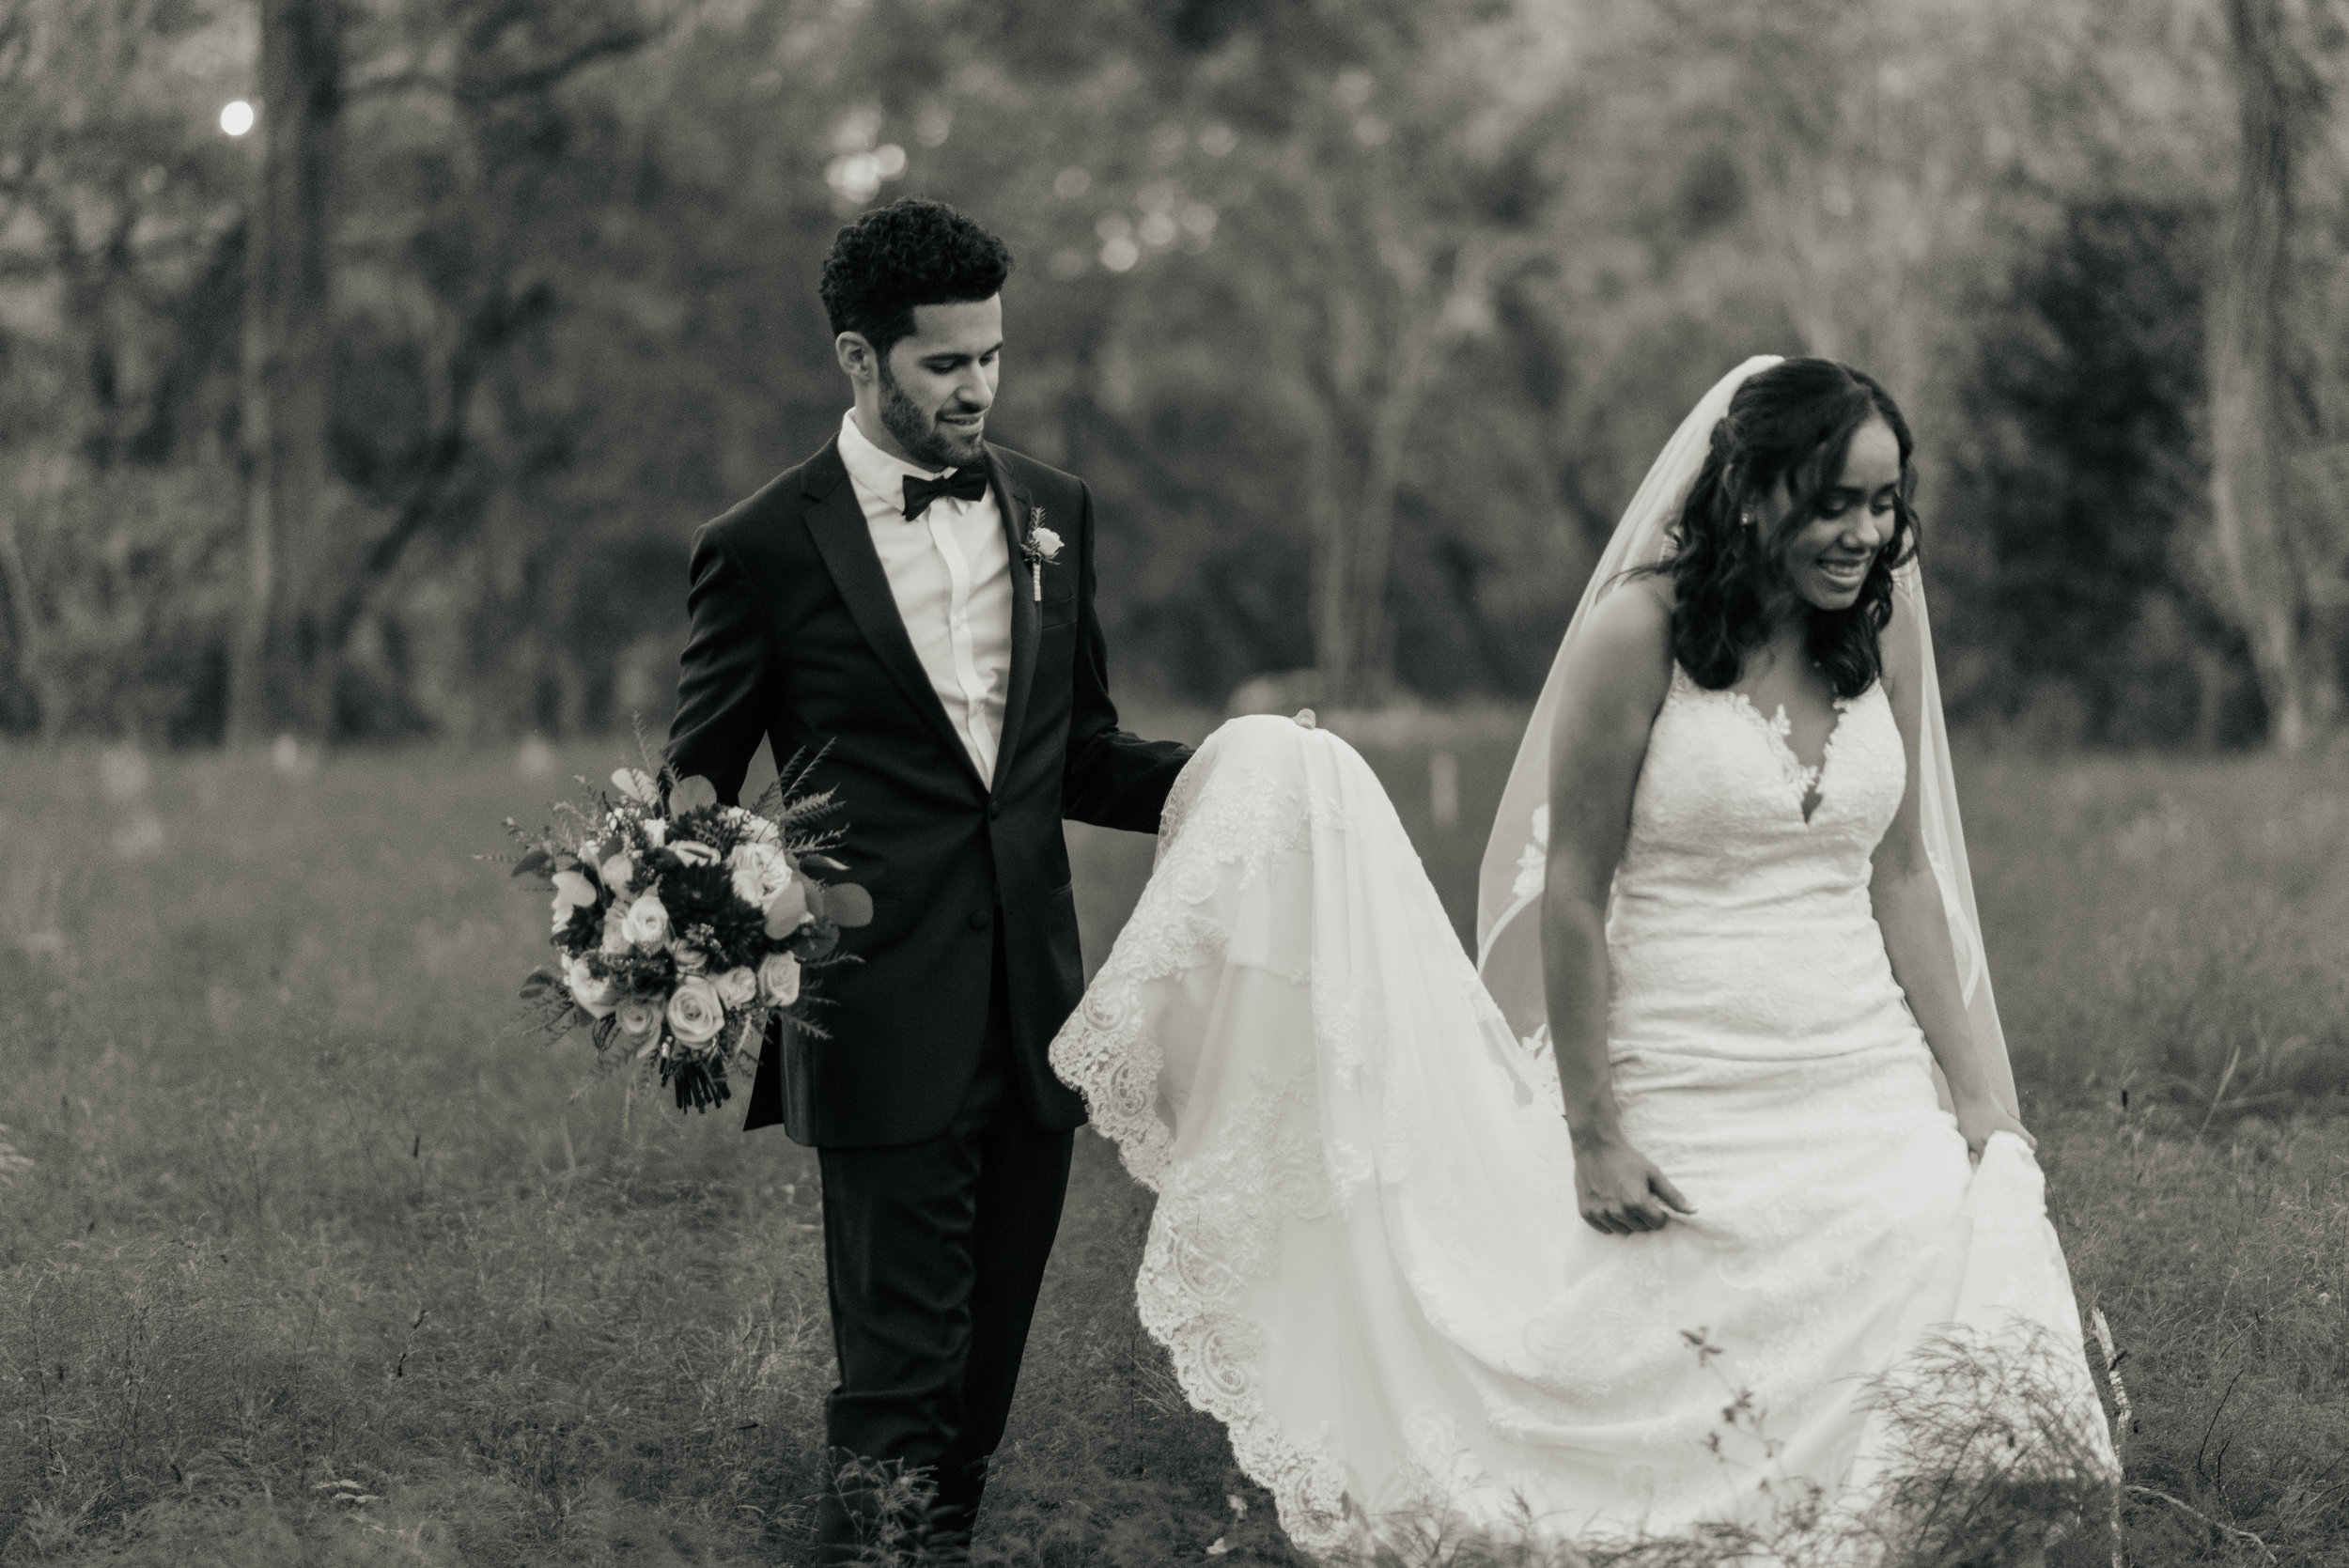 Kirstie-AJ-Wedding-0353.jpg